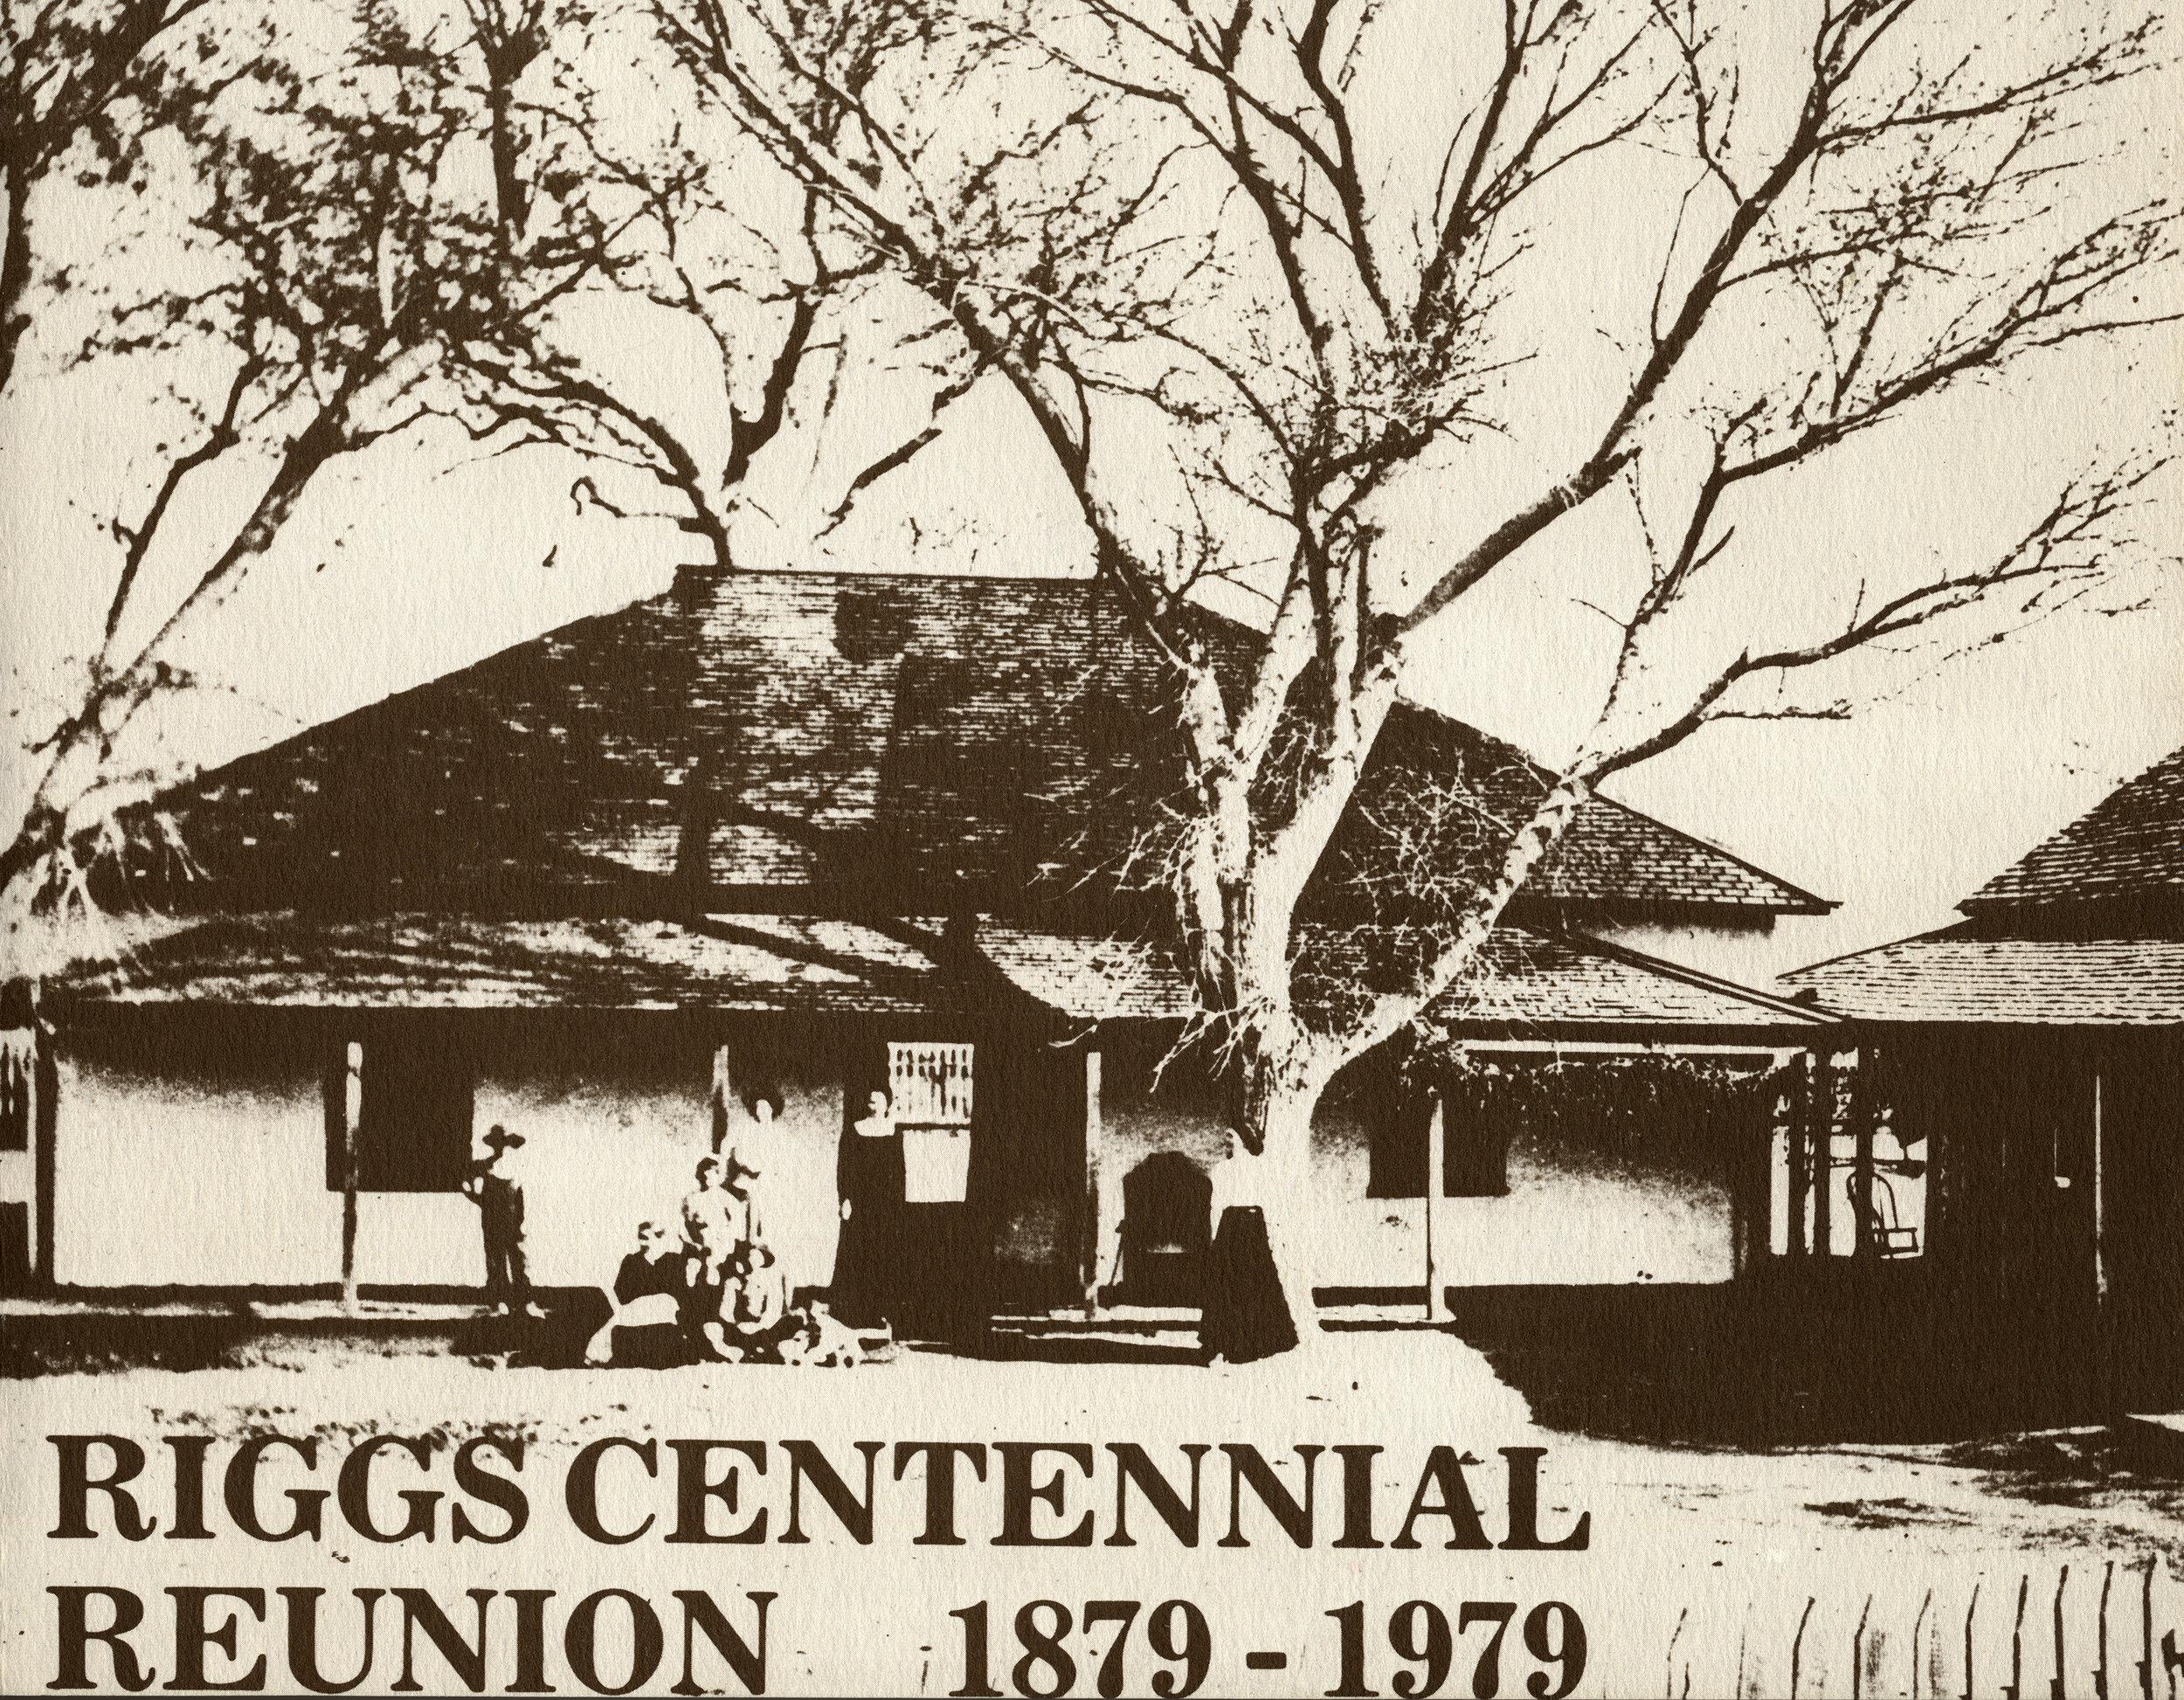 RIGGS CENTENNIAL REUNION 1879 - 1978  COVER